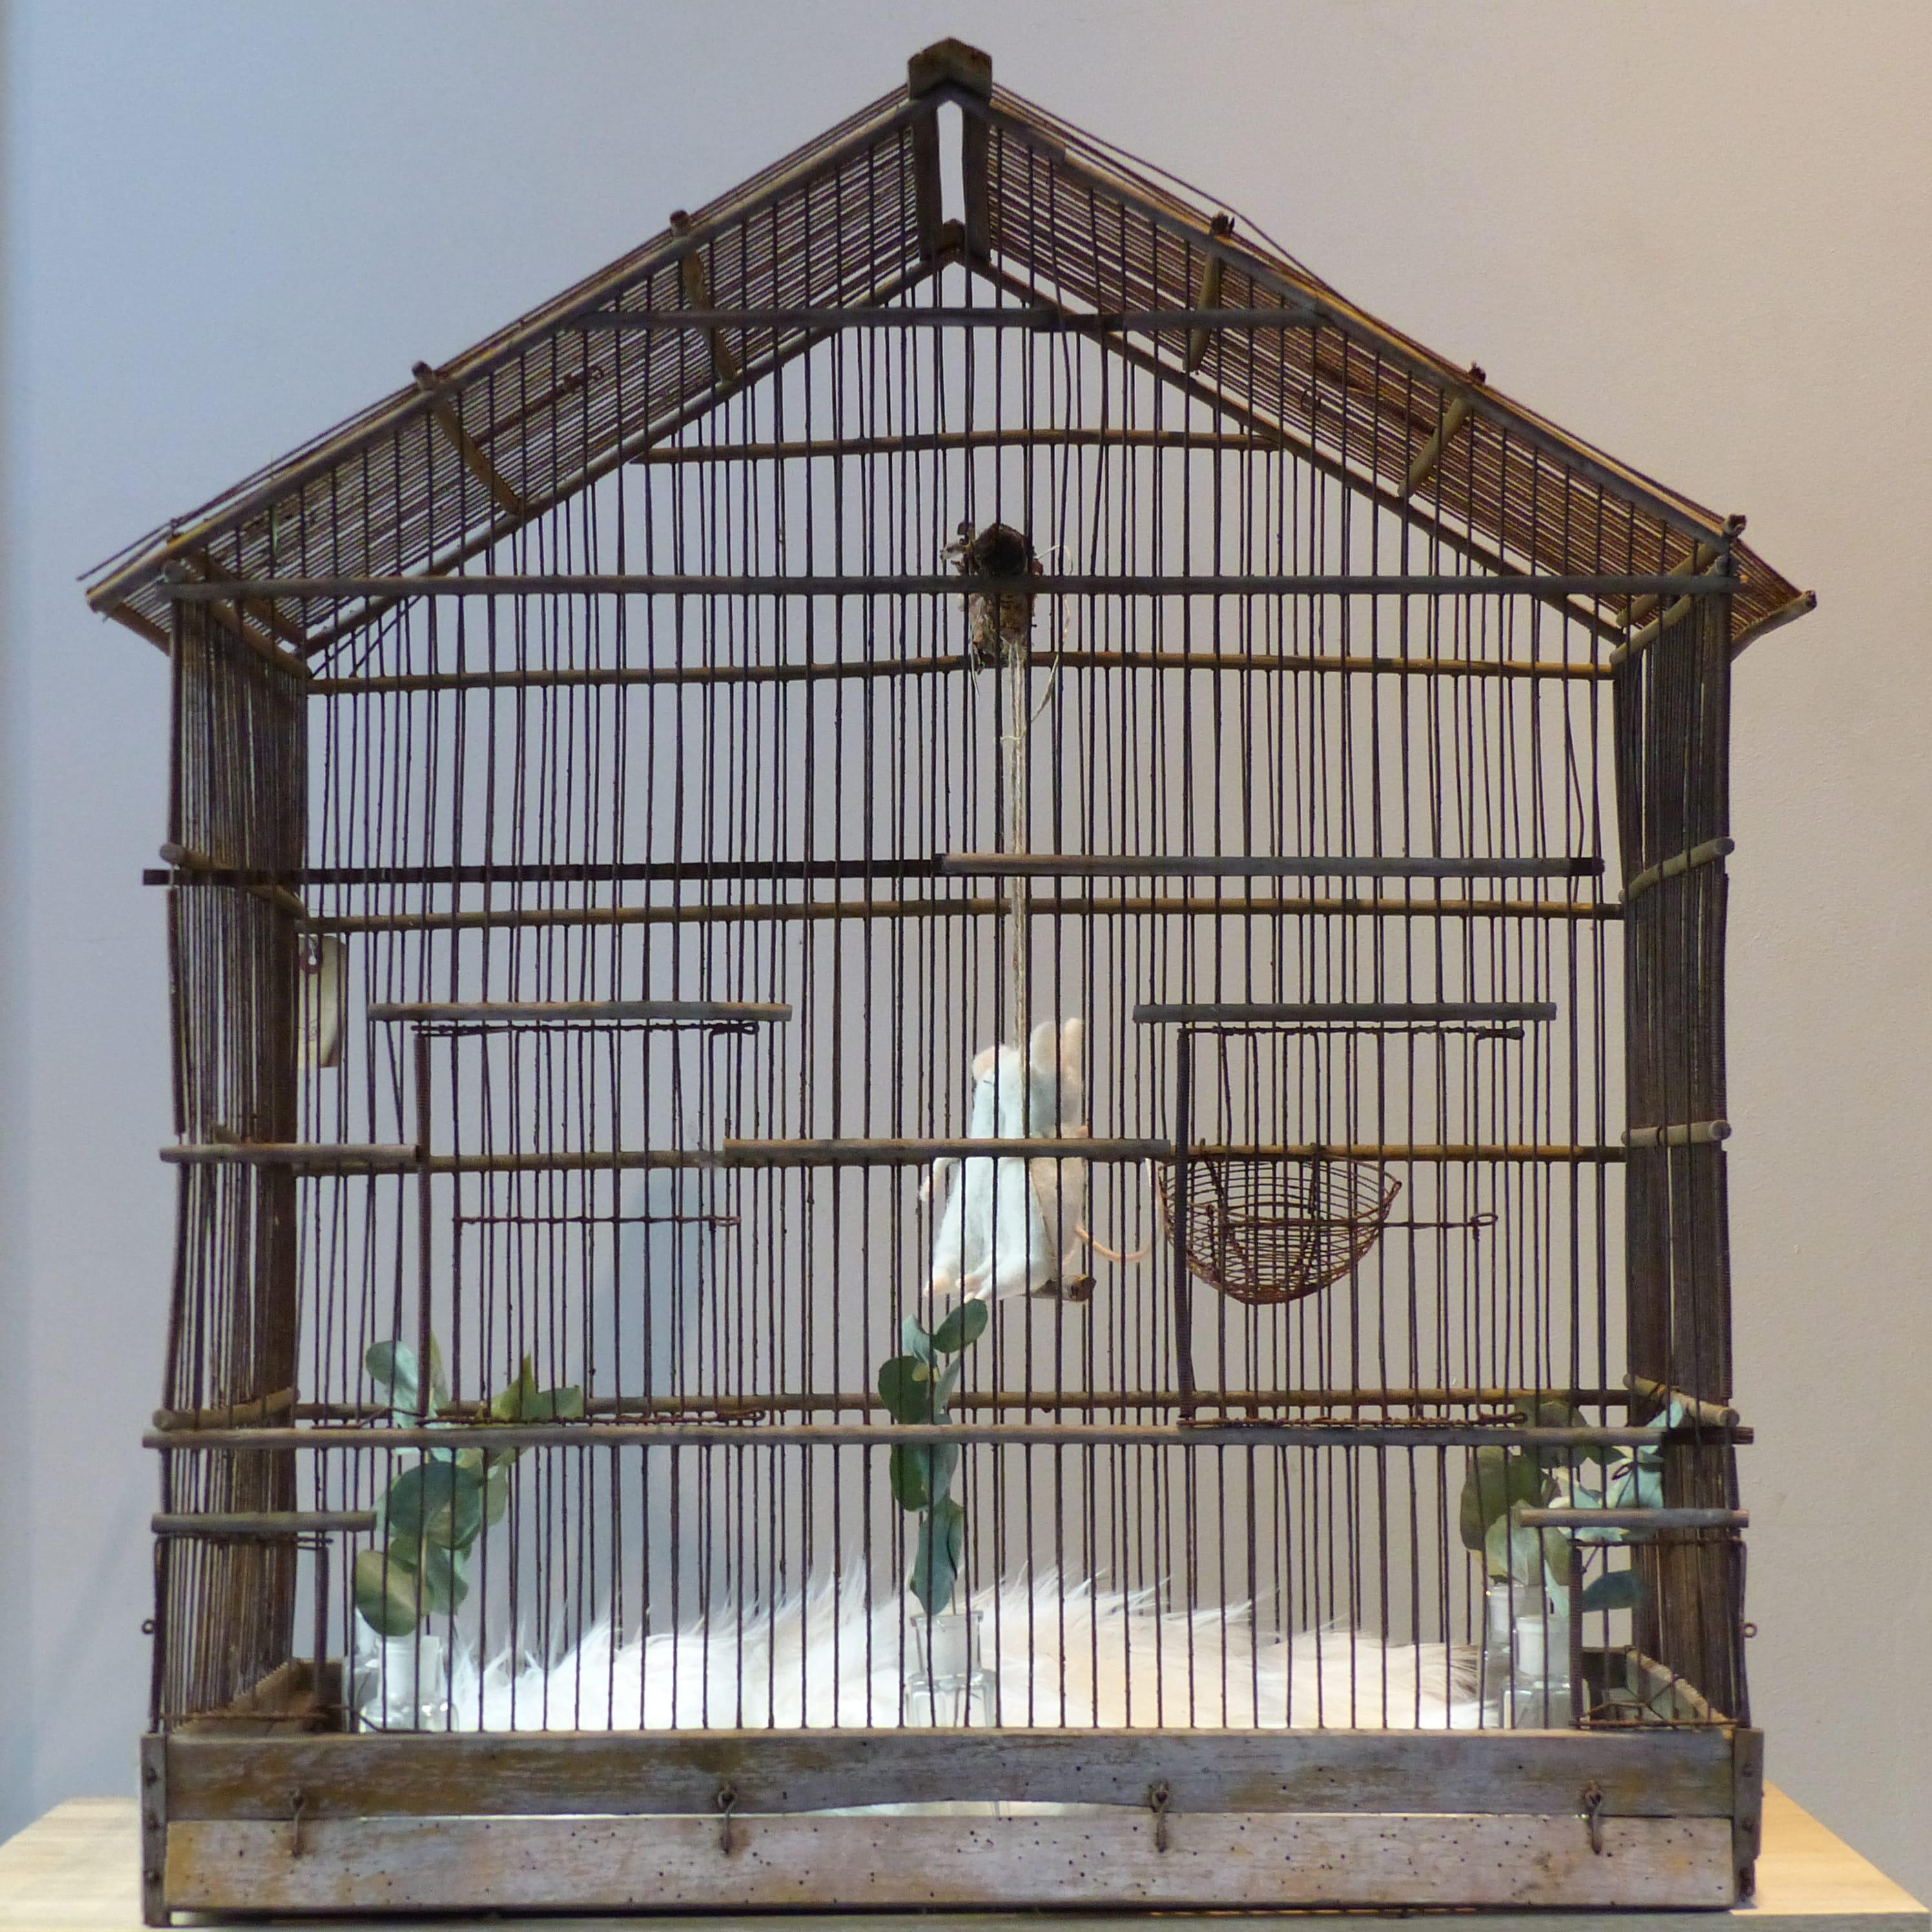 ancienne cage oiseaux en bois et grillage lignedebrocante brocante en ligne chine pour vous. Black Bedroom Furniture Sets. Home Design Ideas